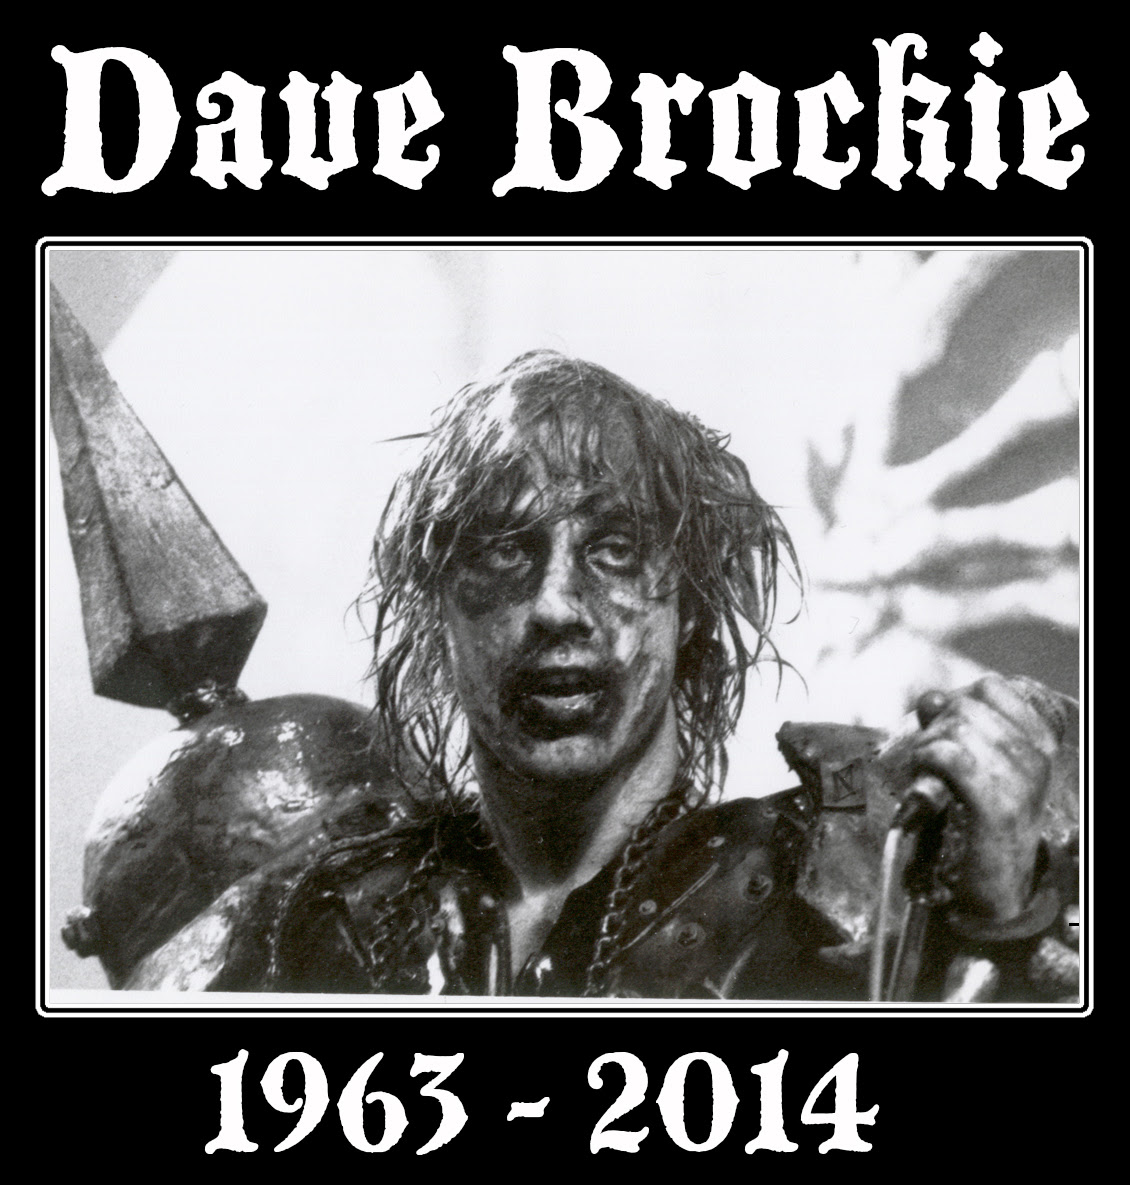 Gwar Dave Brockie